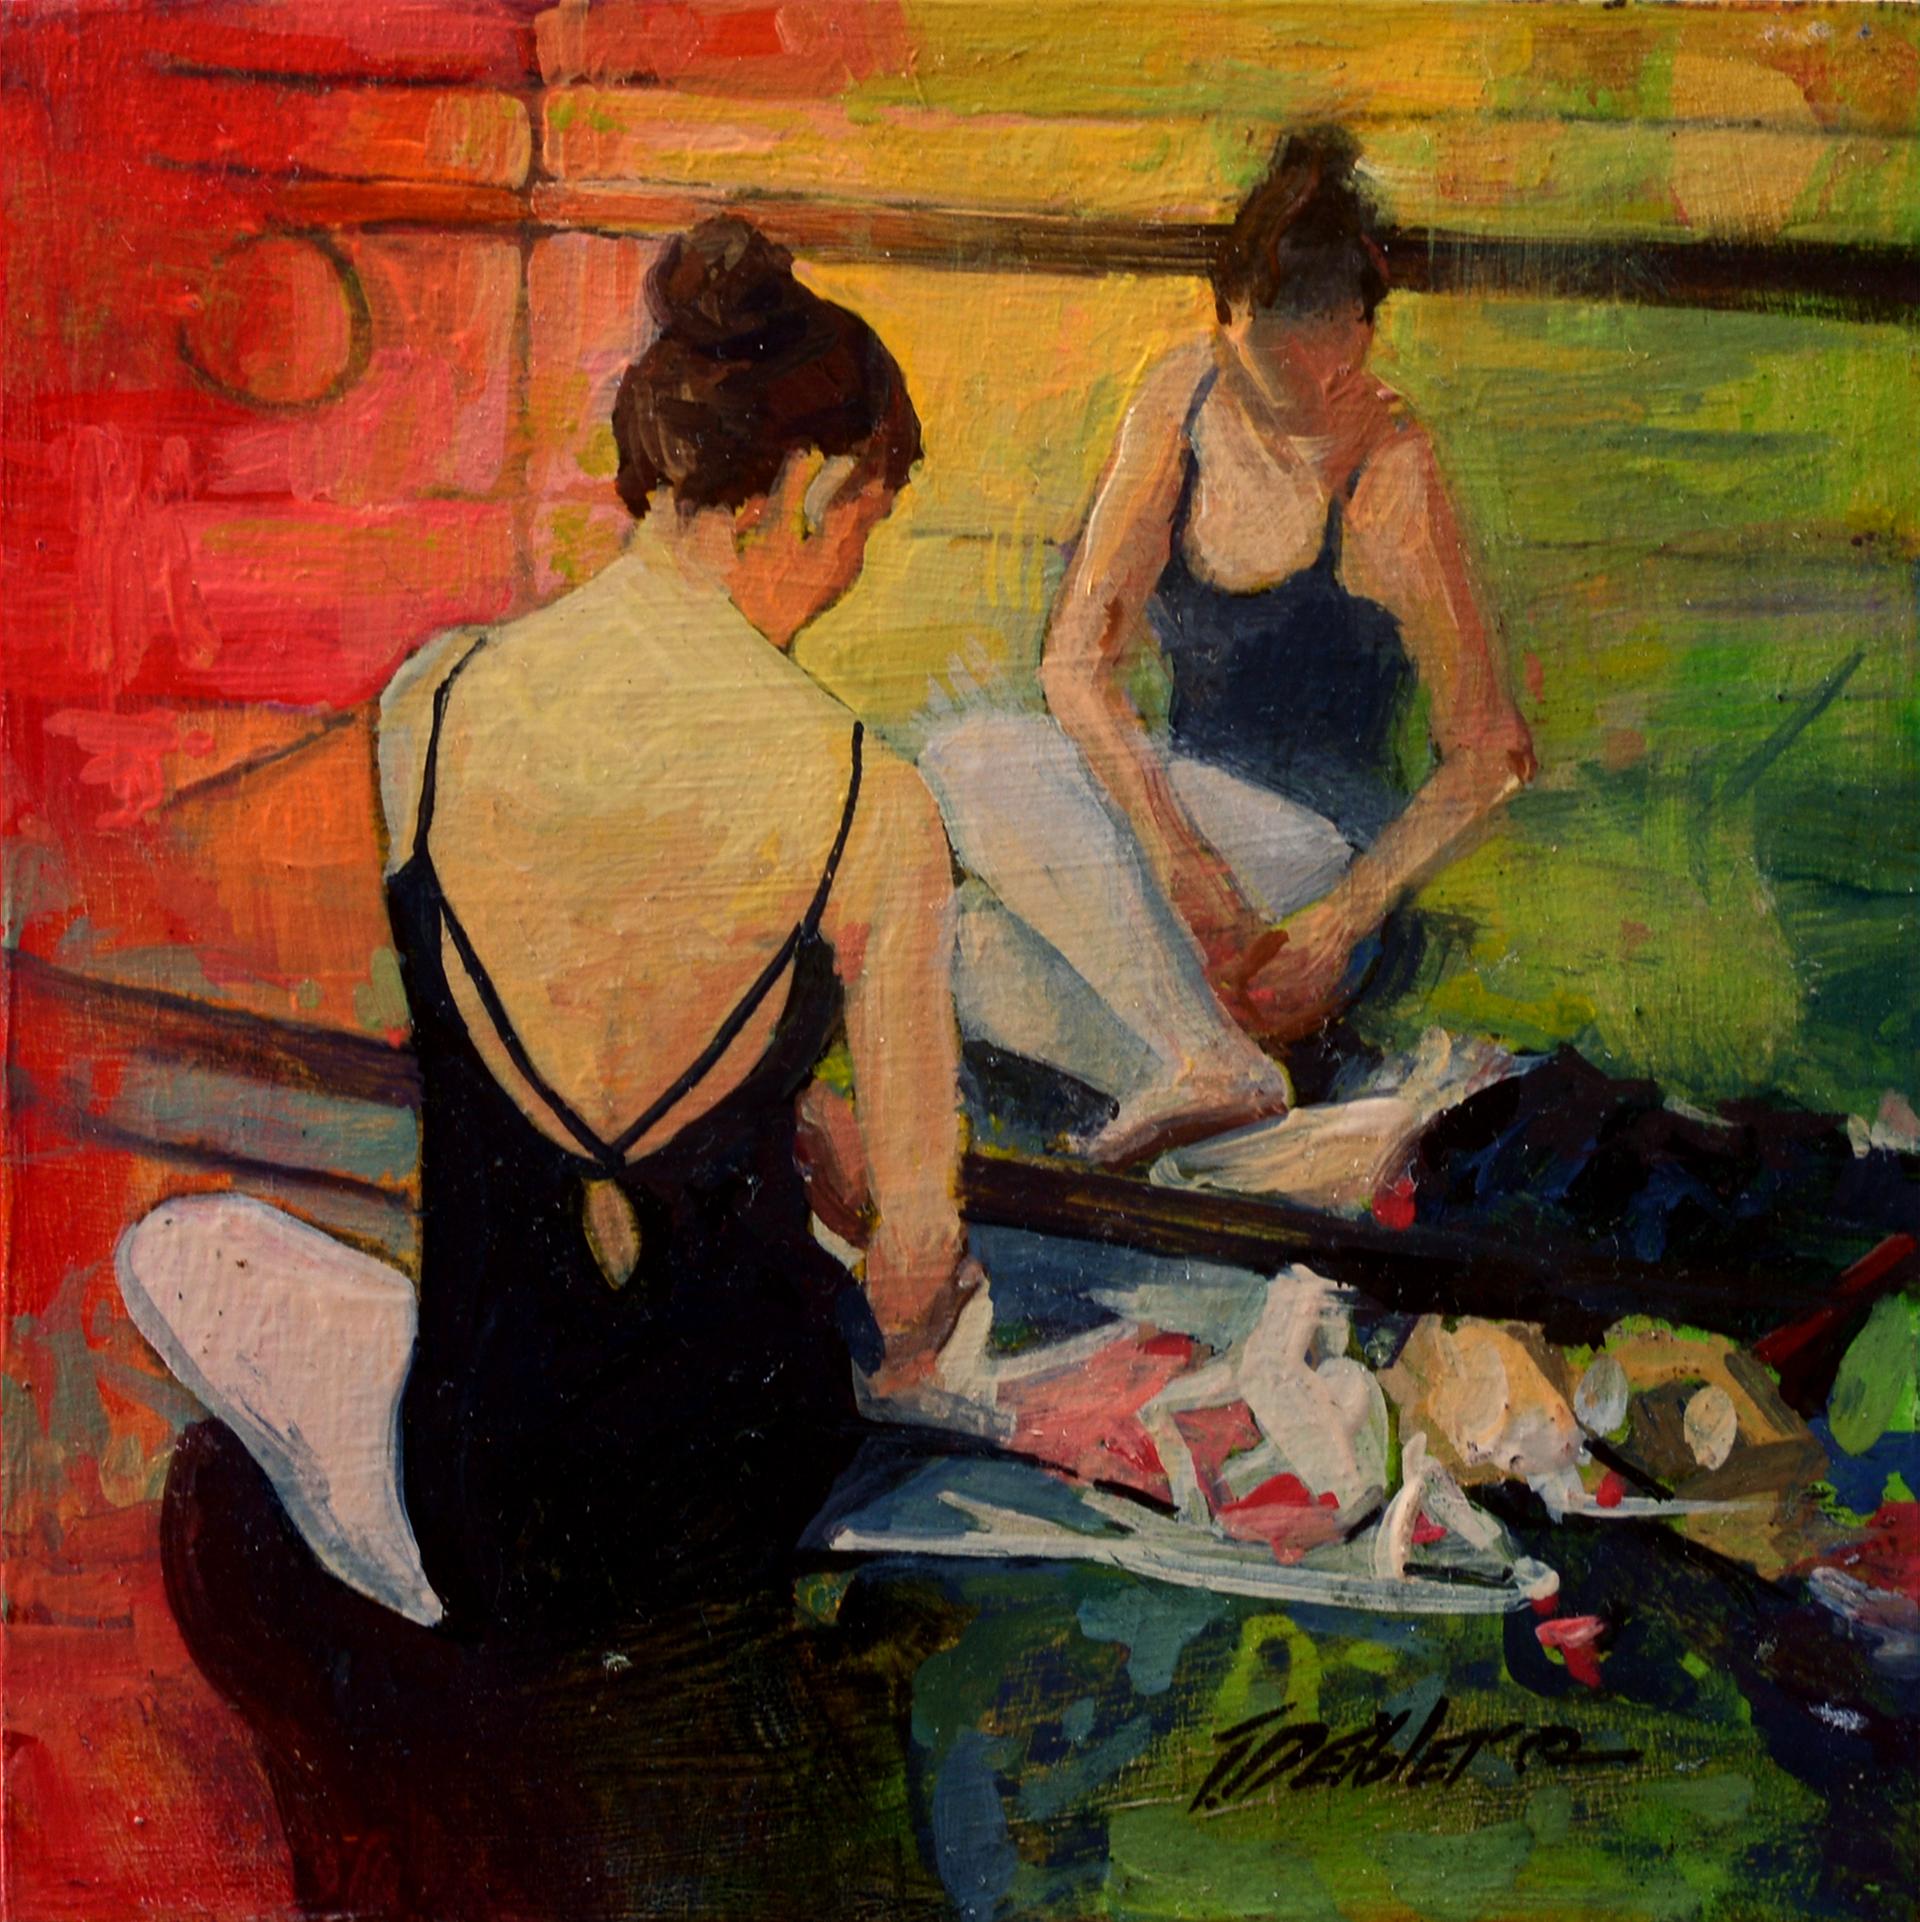 Studio Reflections by Tim Deibler